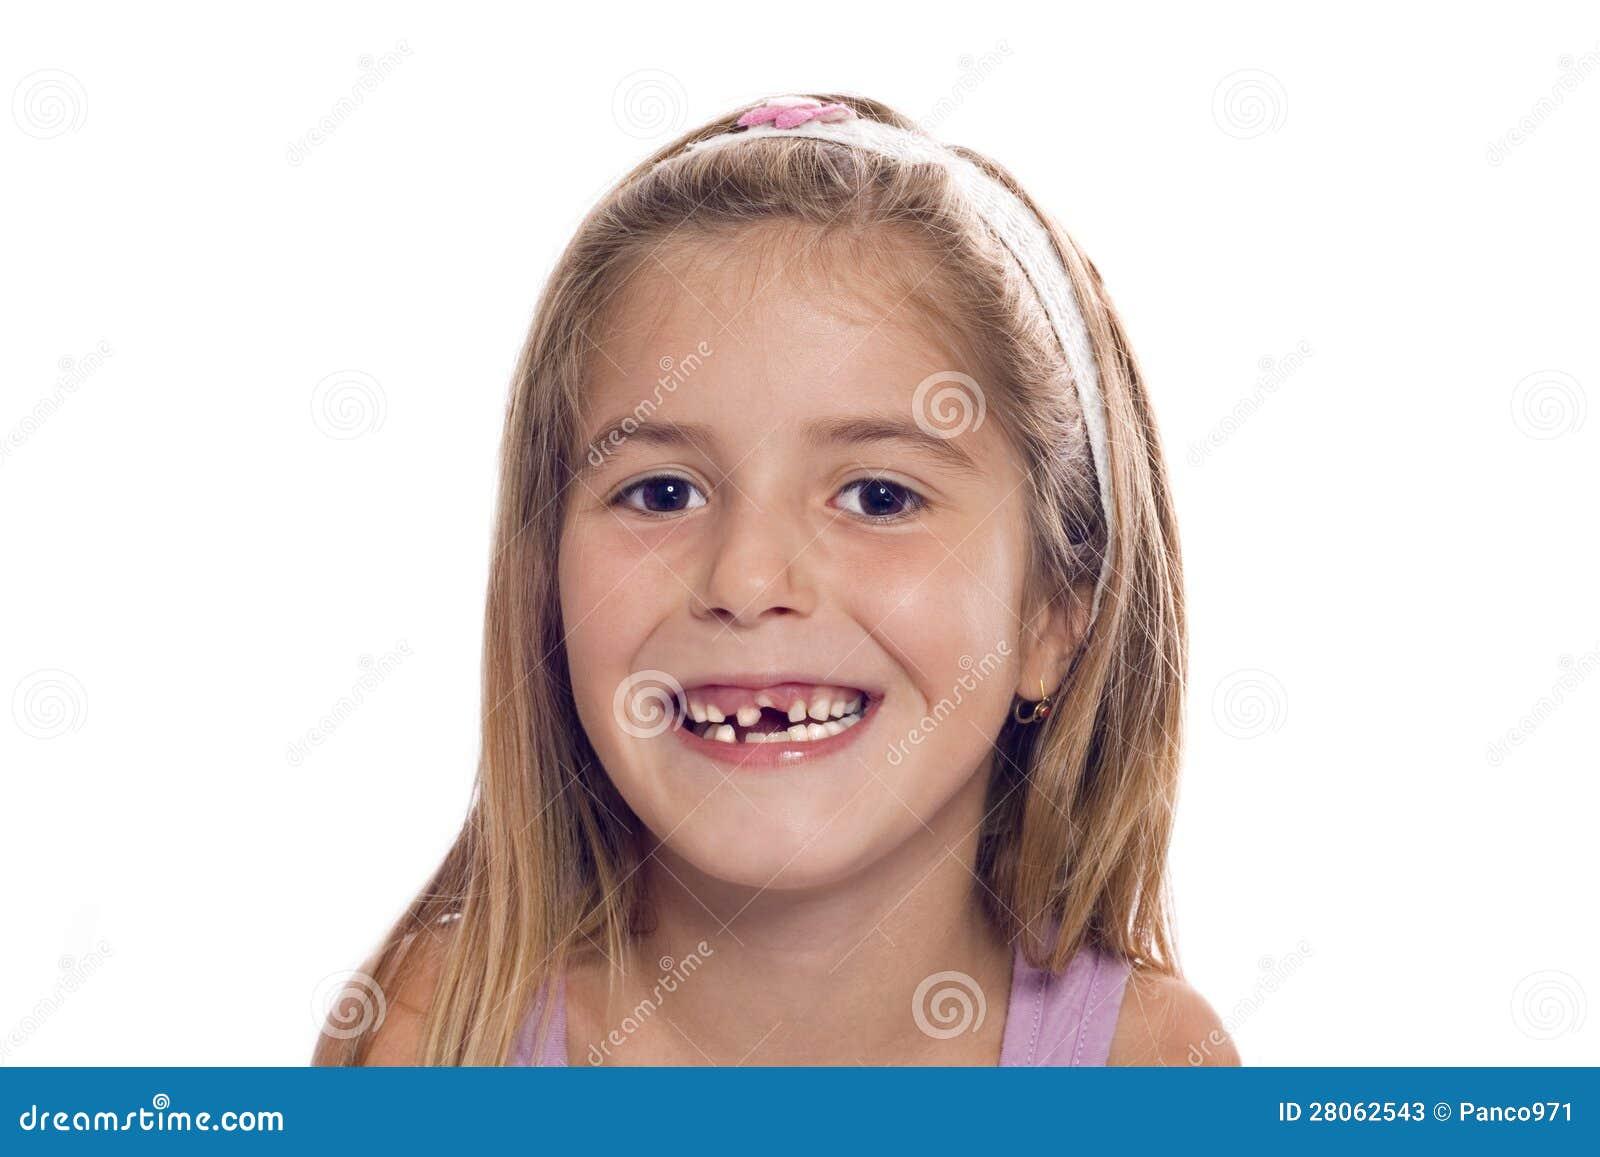 little girl smile stock photos image 28062543